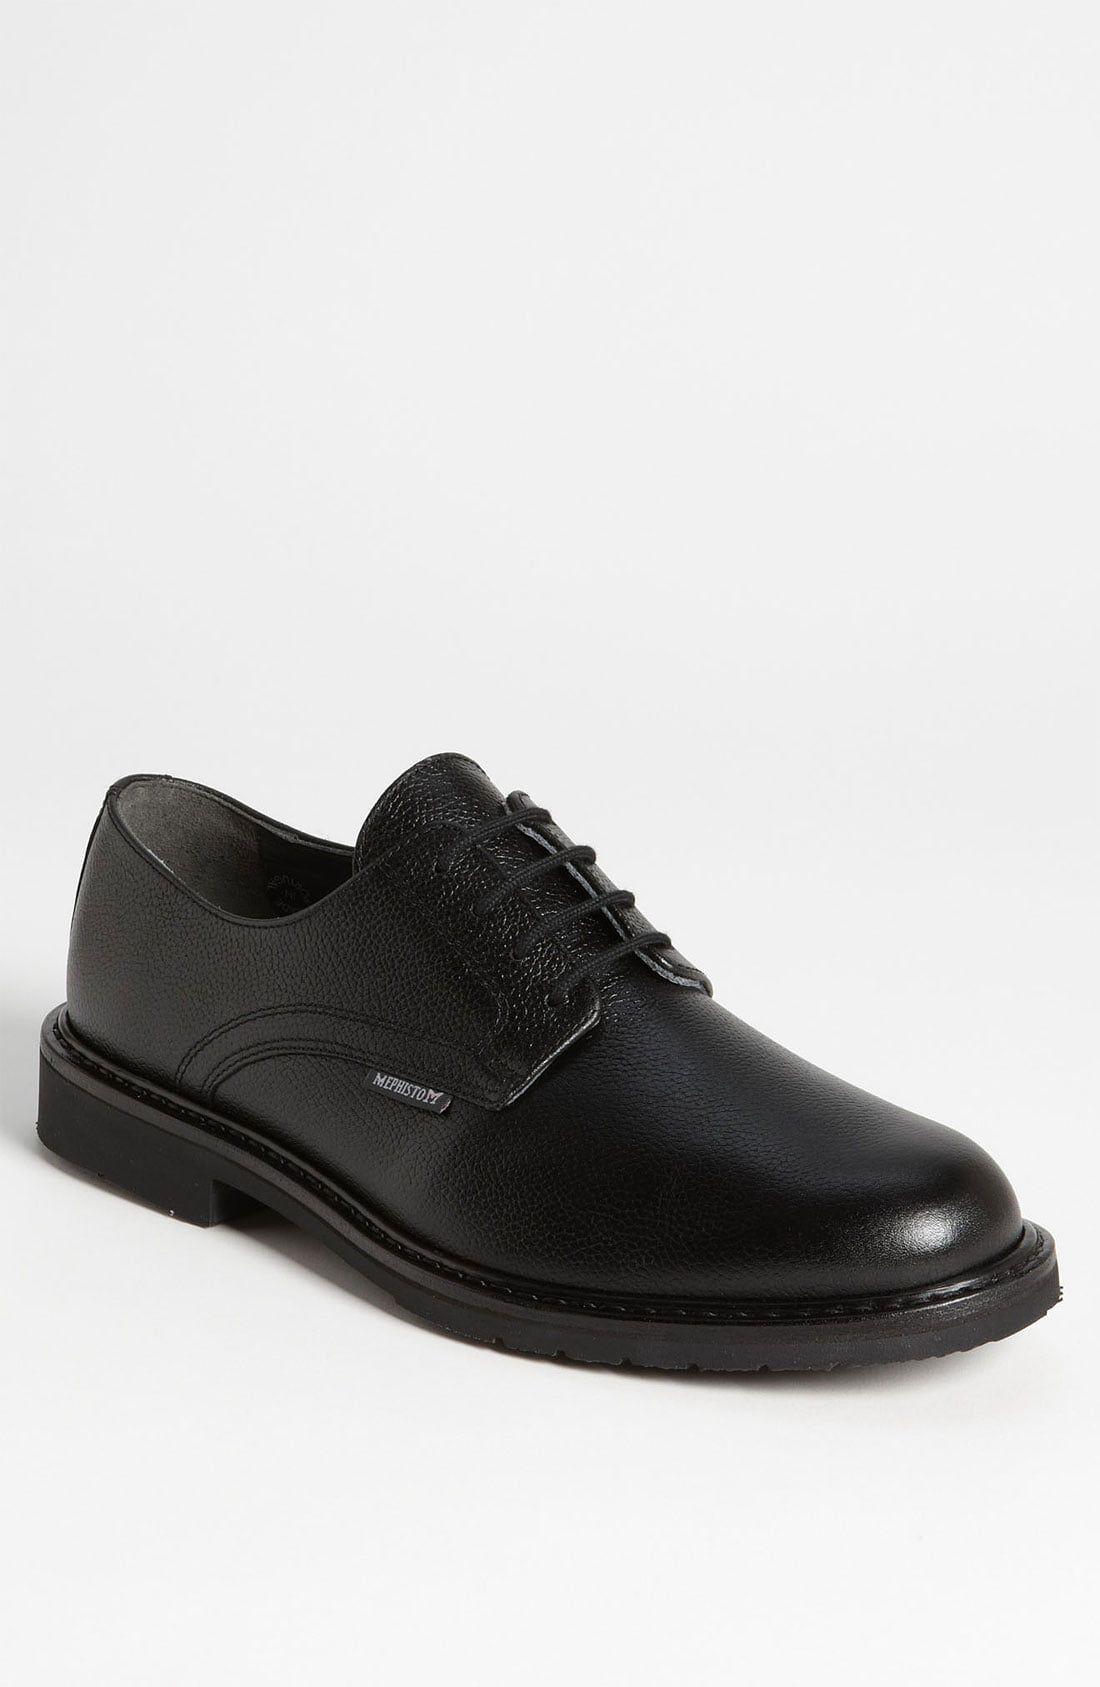 Men S Mephisto Marlon Derby Size 8 5 M Black Derby Shoes